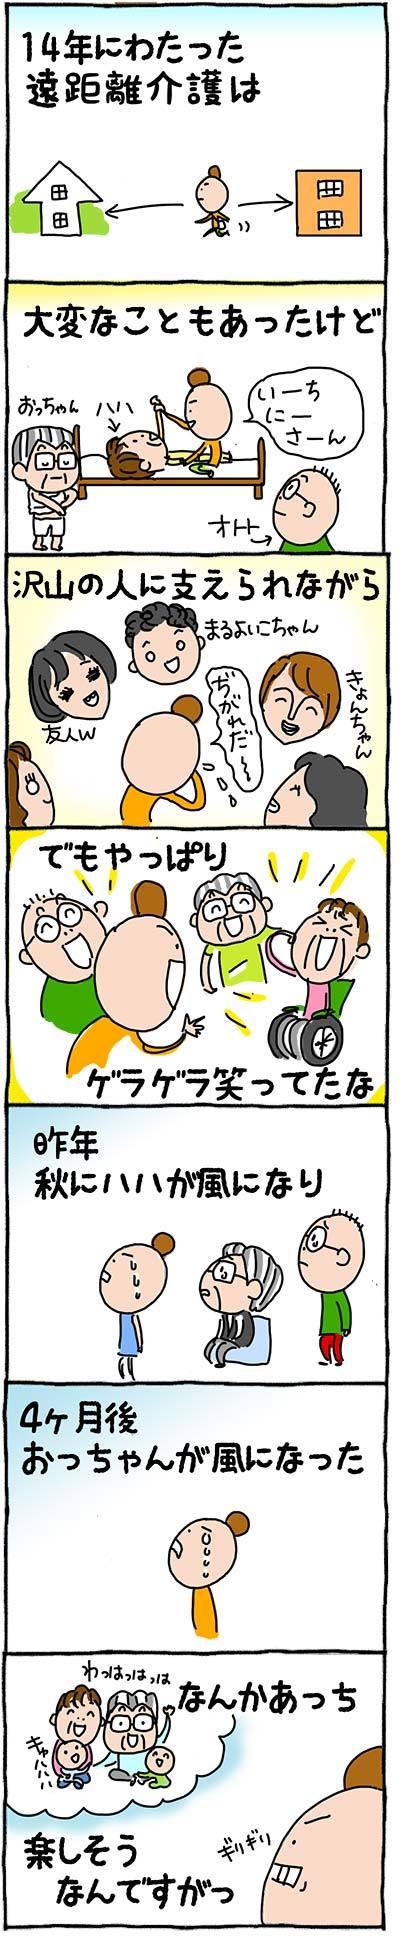 170707自己紹介05